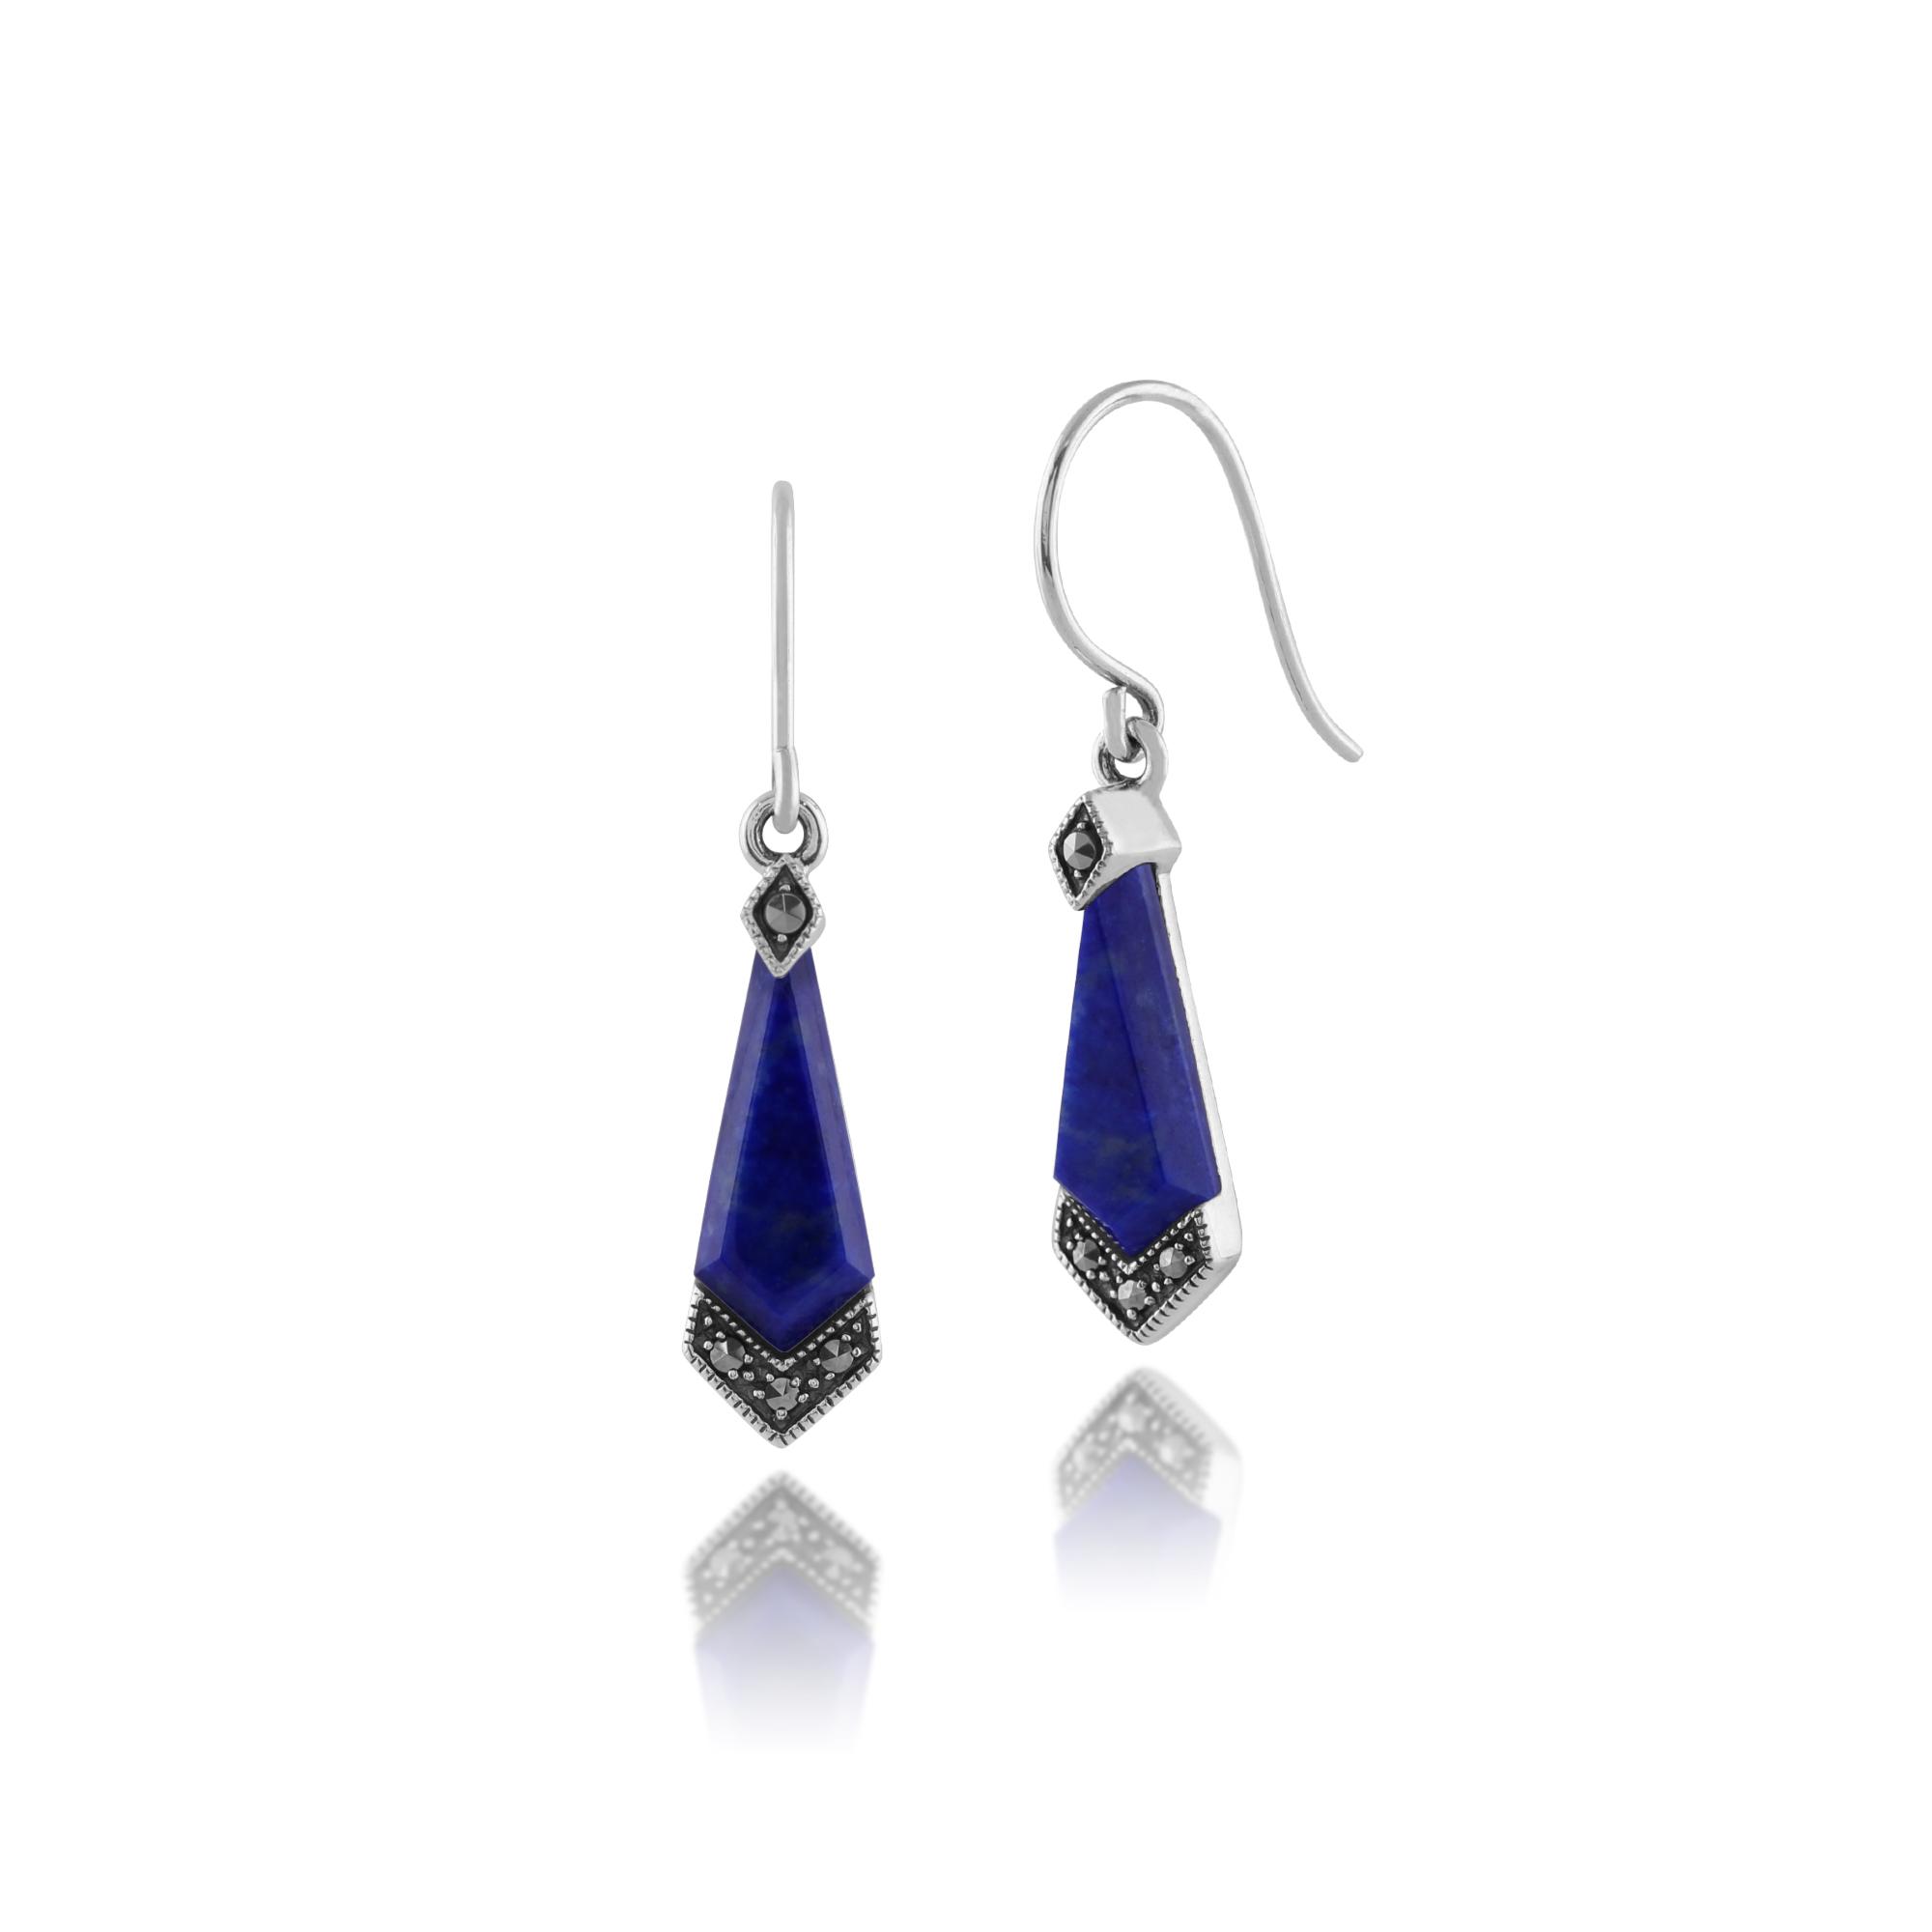 gemondo 925 sterling silver 2ct lapis lazuli marcasite art deco drop earrings ebay. Black Bedroom Furniture Sets. Home Design Ideas